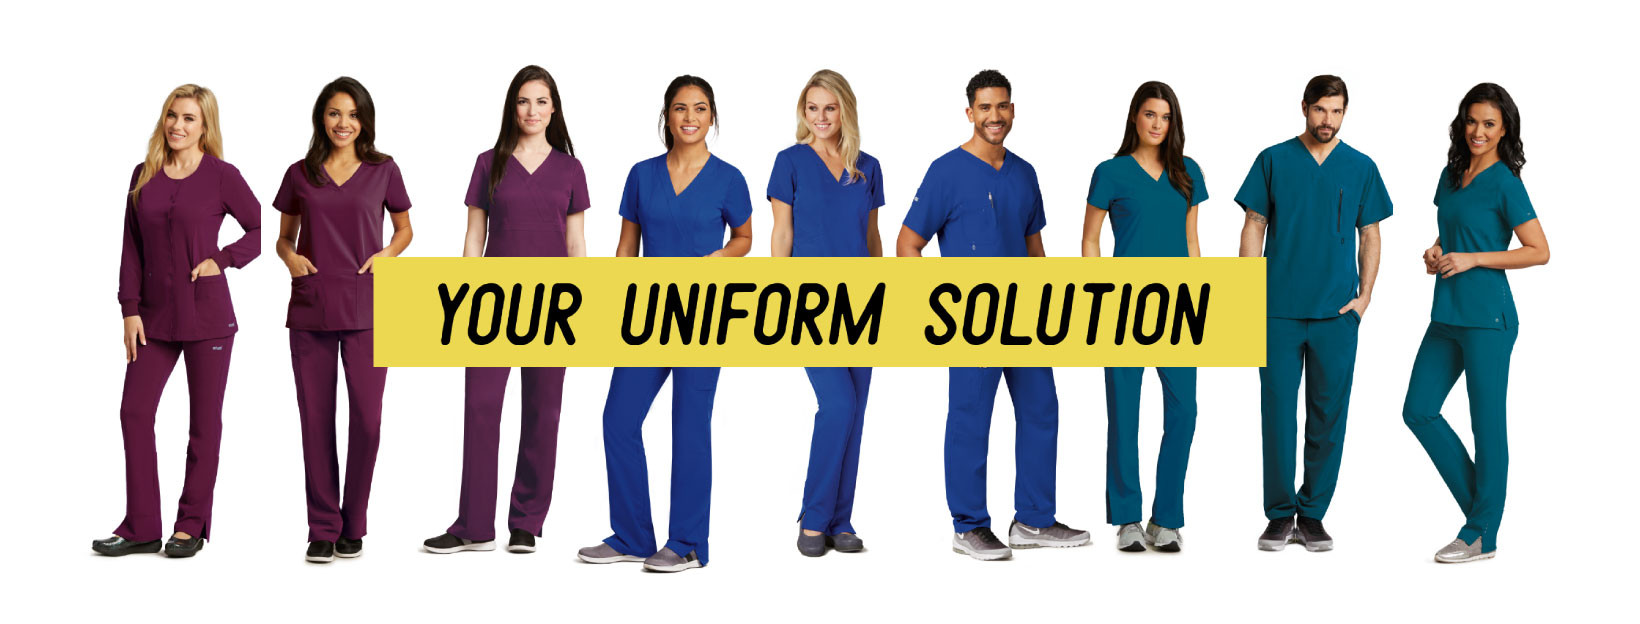 Sunshine Medical Uniforms Embroidery | San Antonio Texas